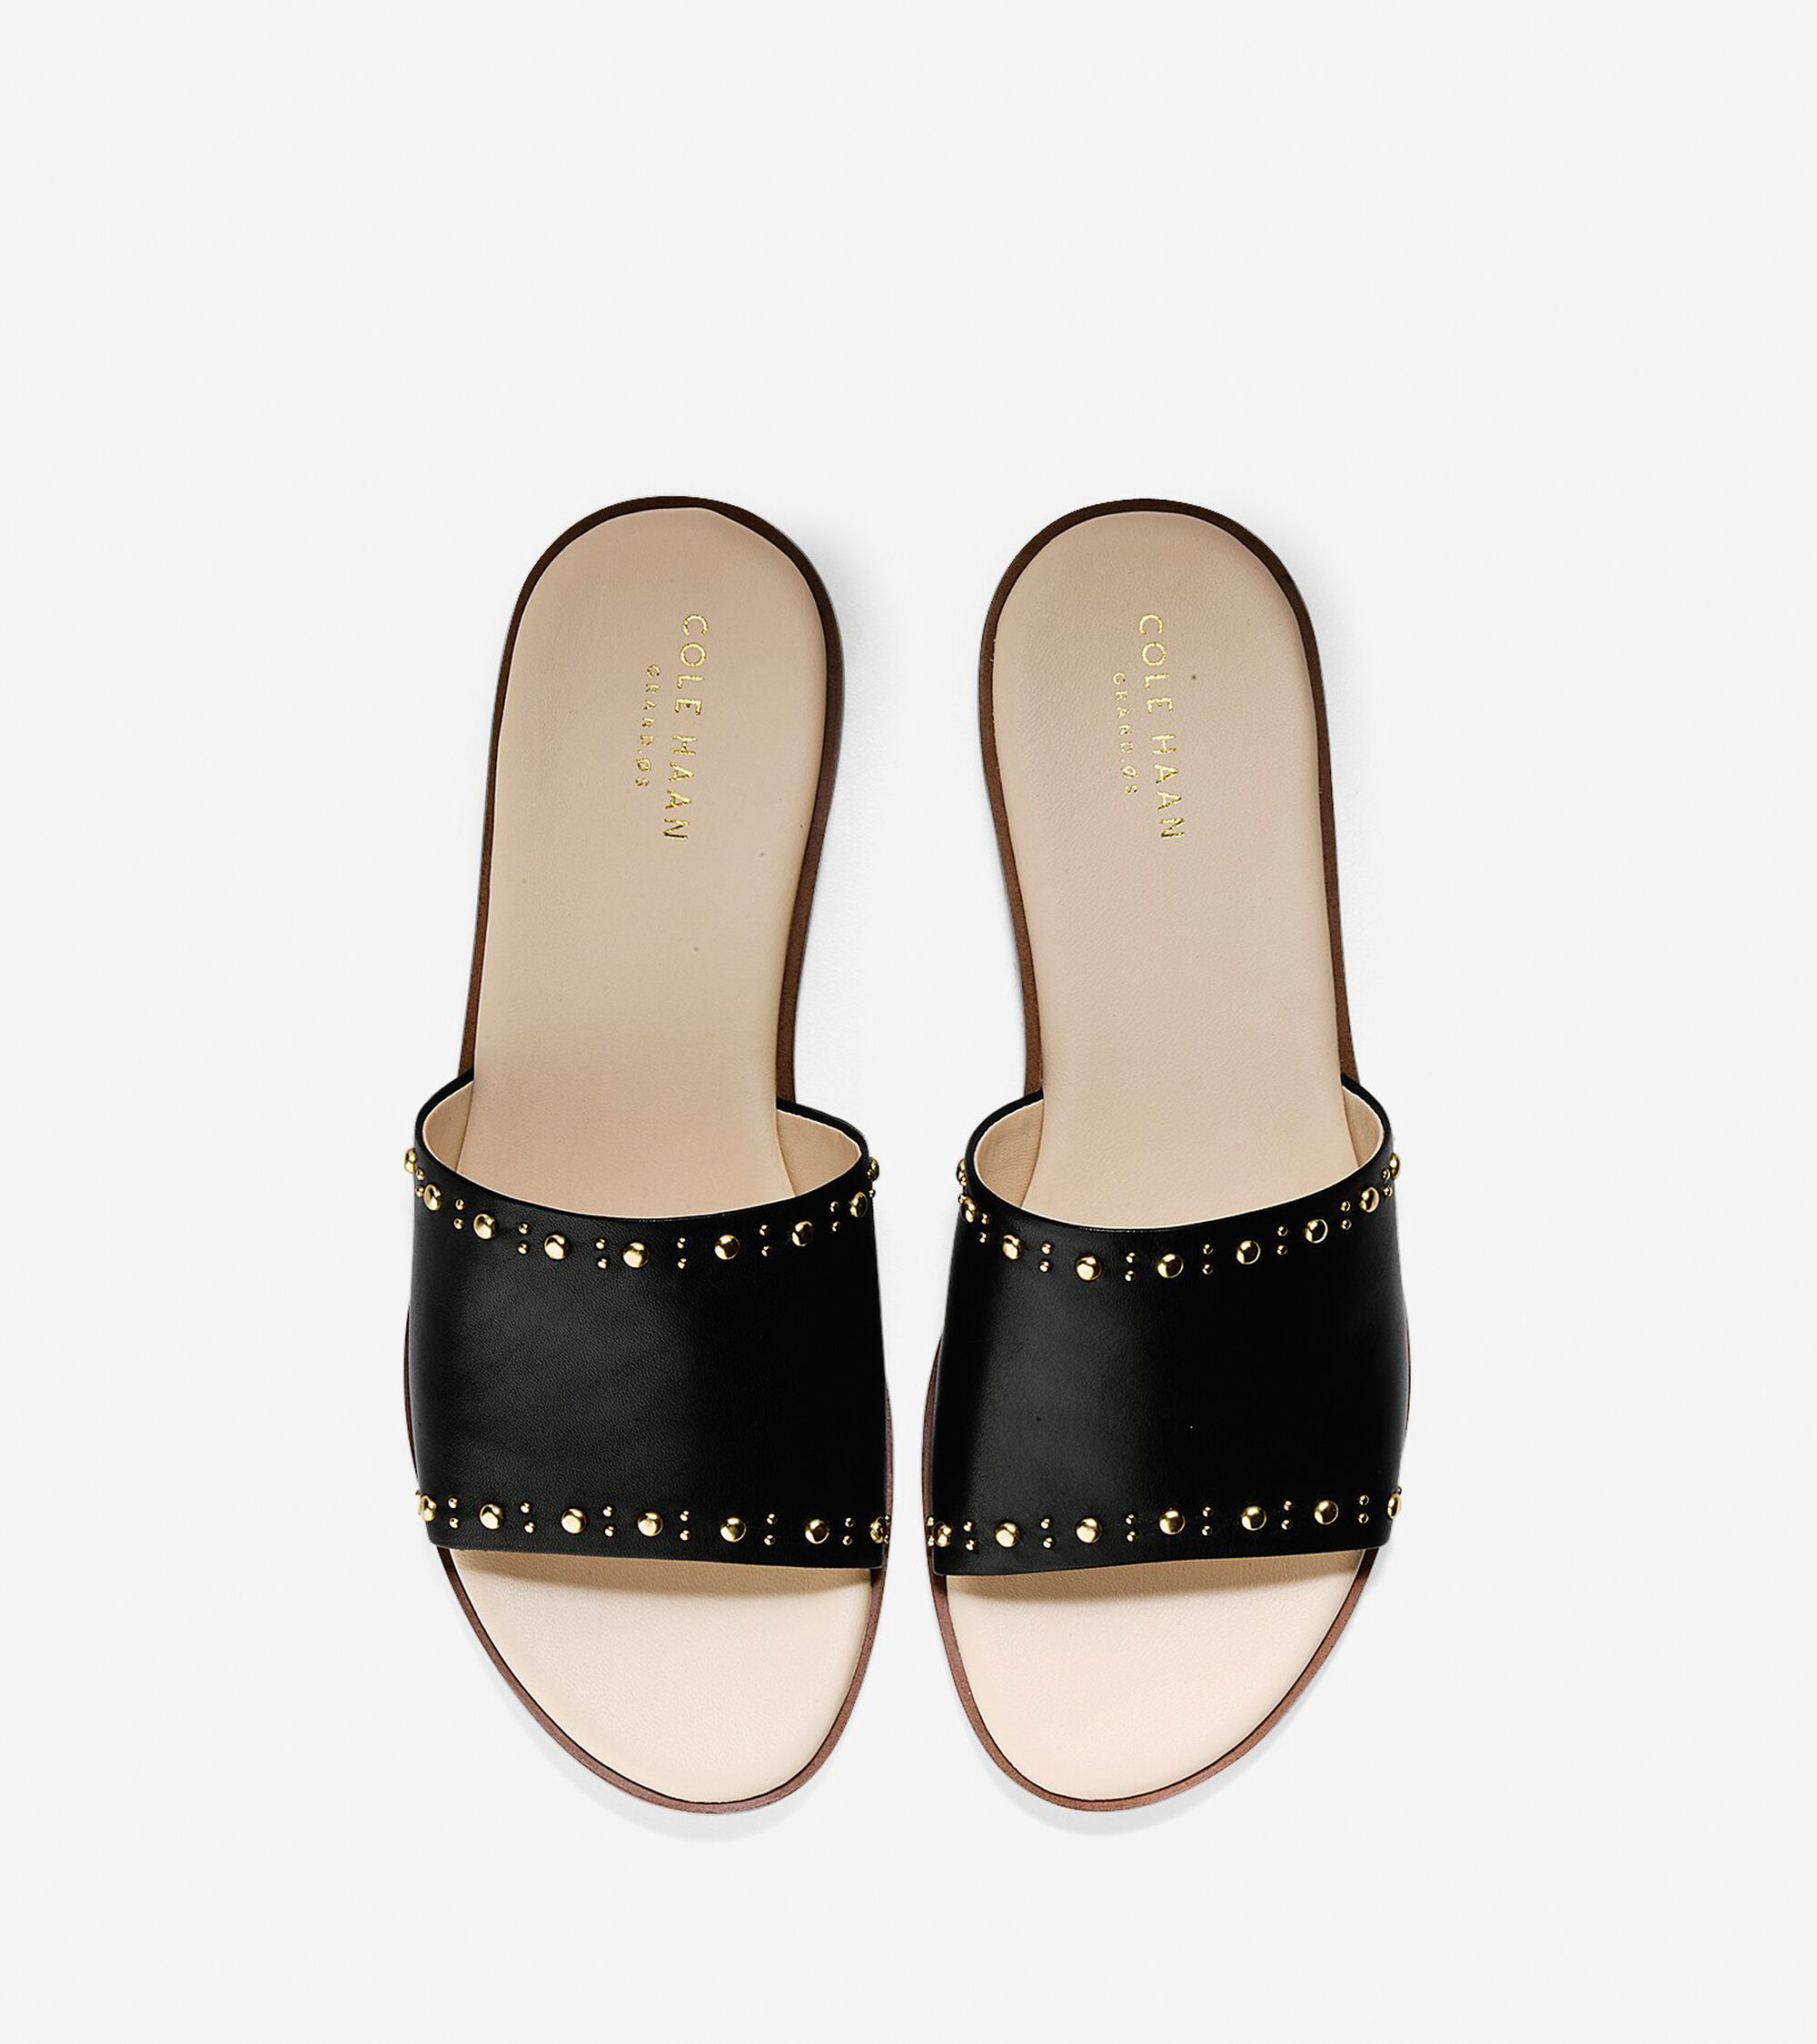 47933d316f8 Women s Anica Stud Slide Sandals in Black Leather